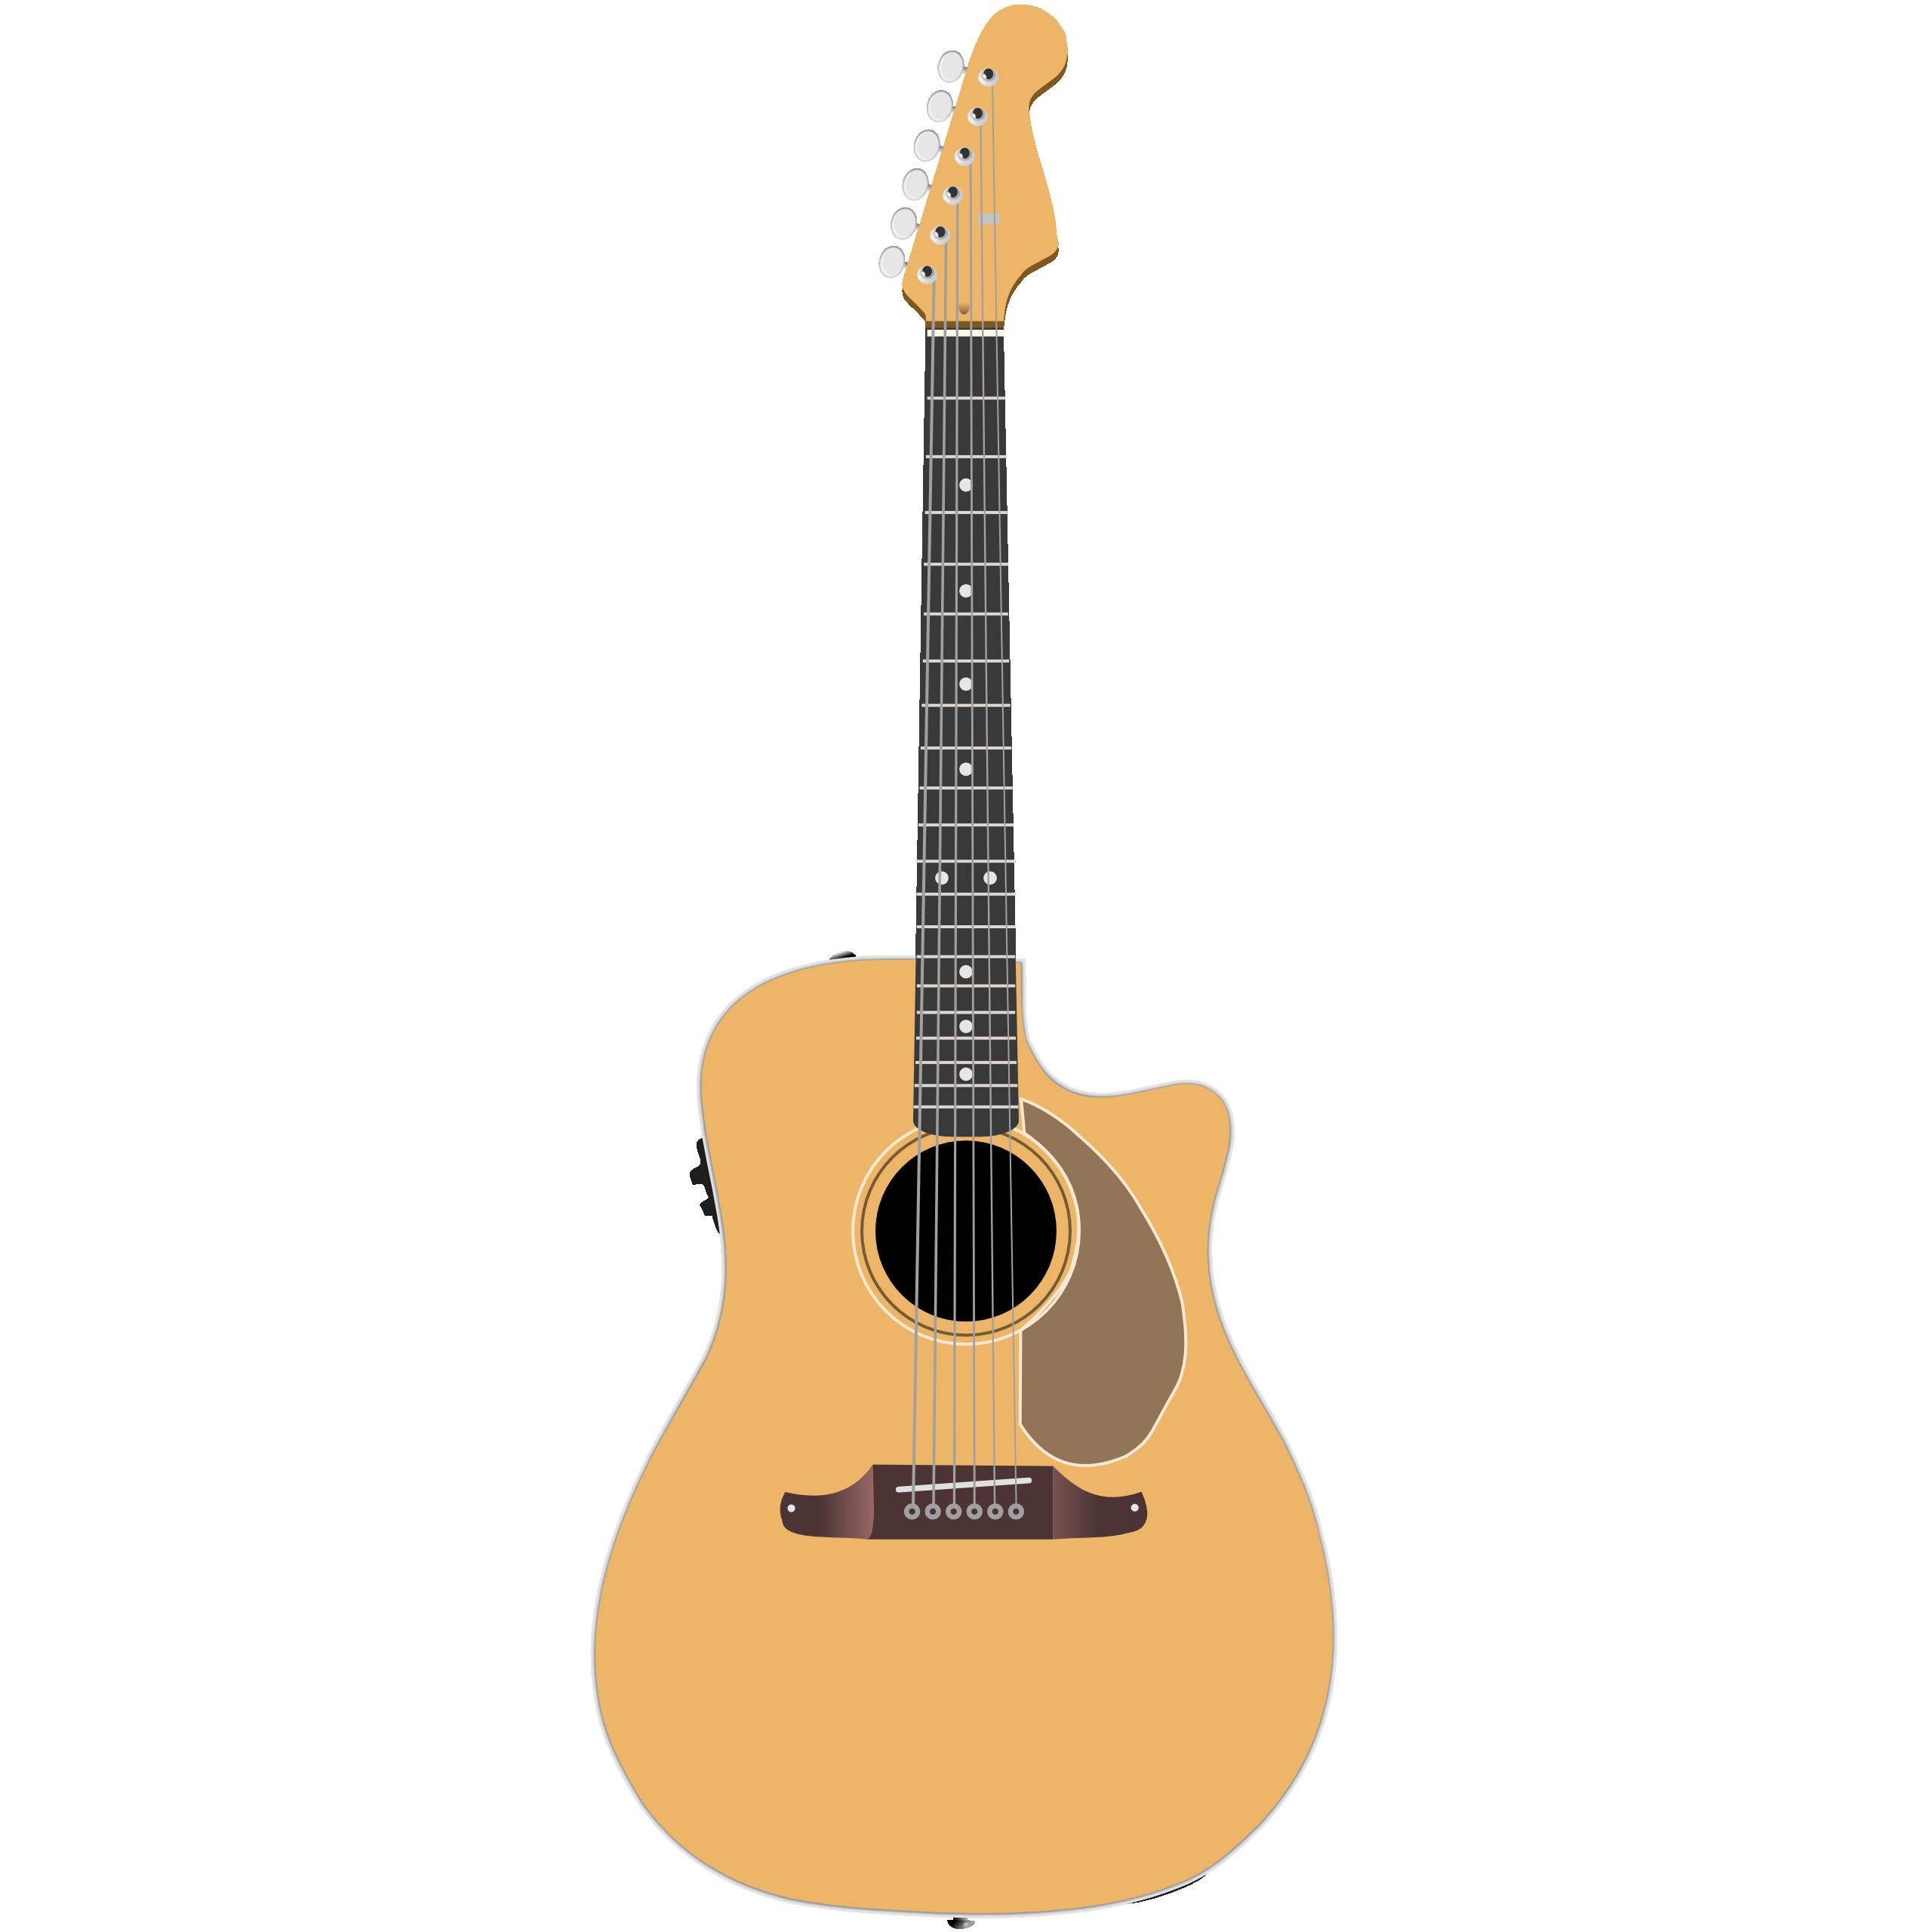 Guitar Vector Cartoon By Thegoldenbox D6jjn34 Png 2 560 2 560 Pixels Guitar Vector Guitar Cartoon